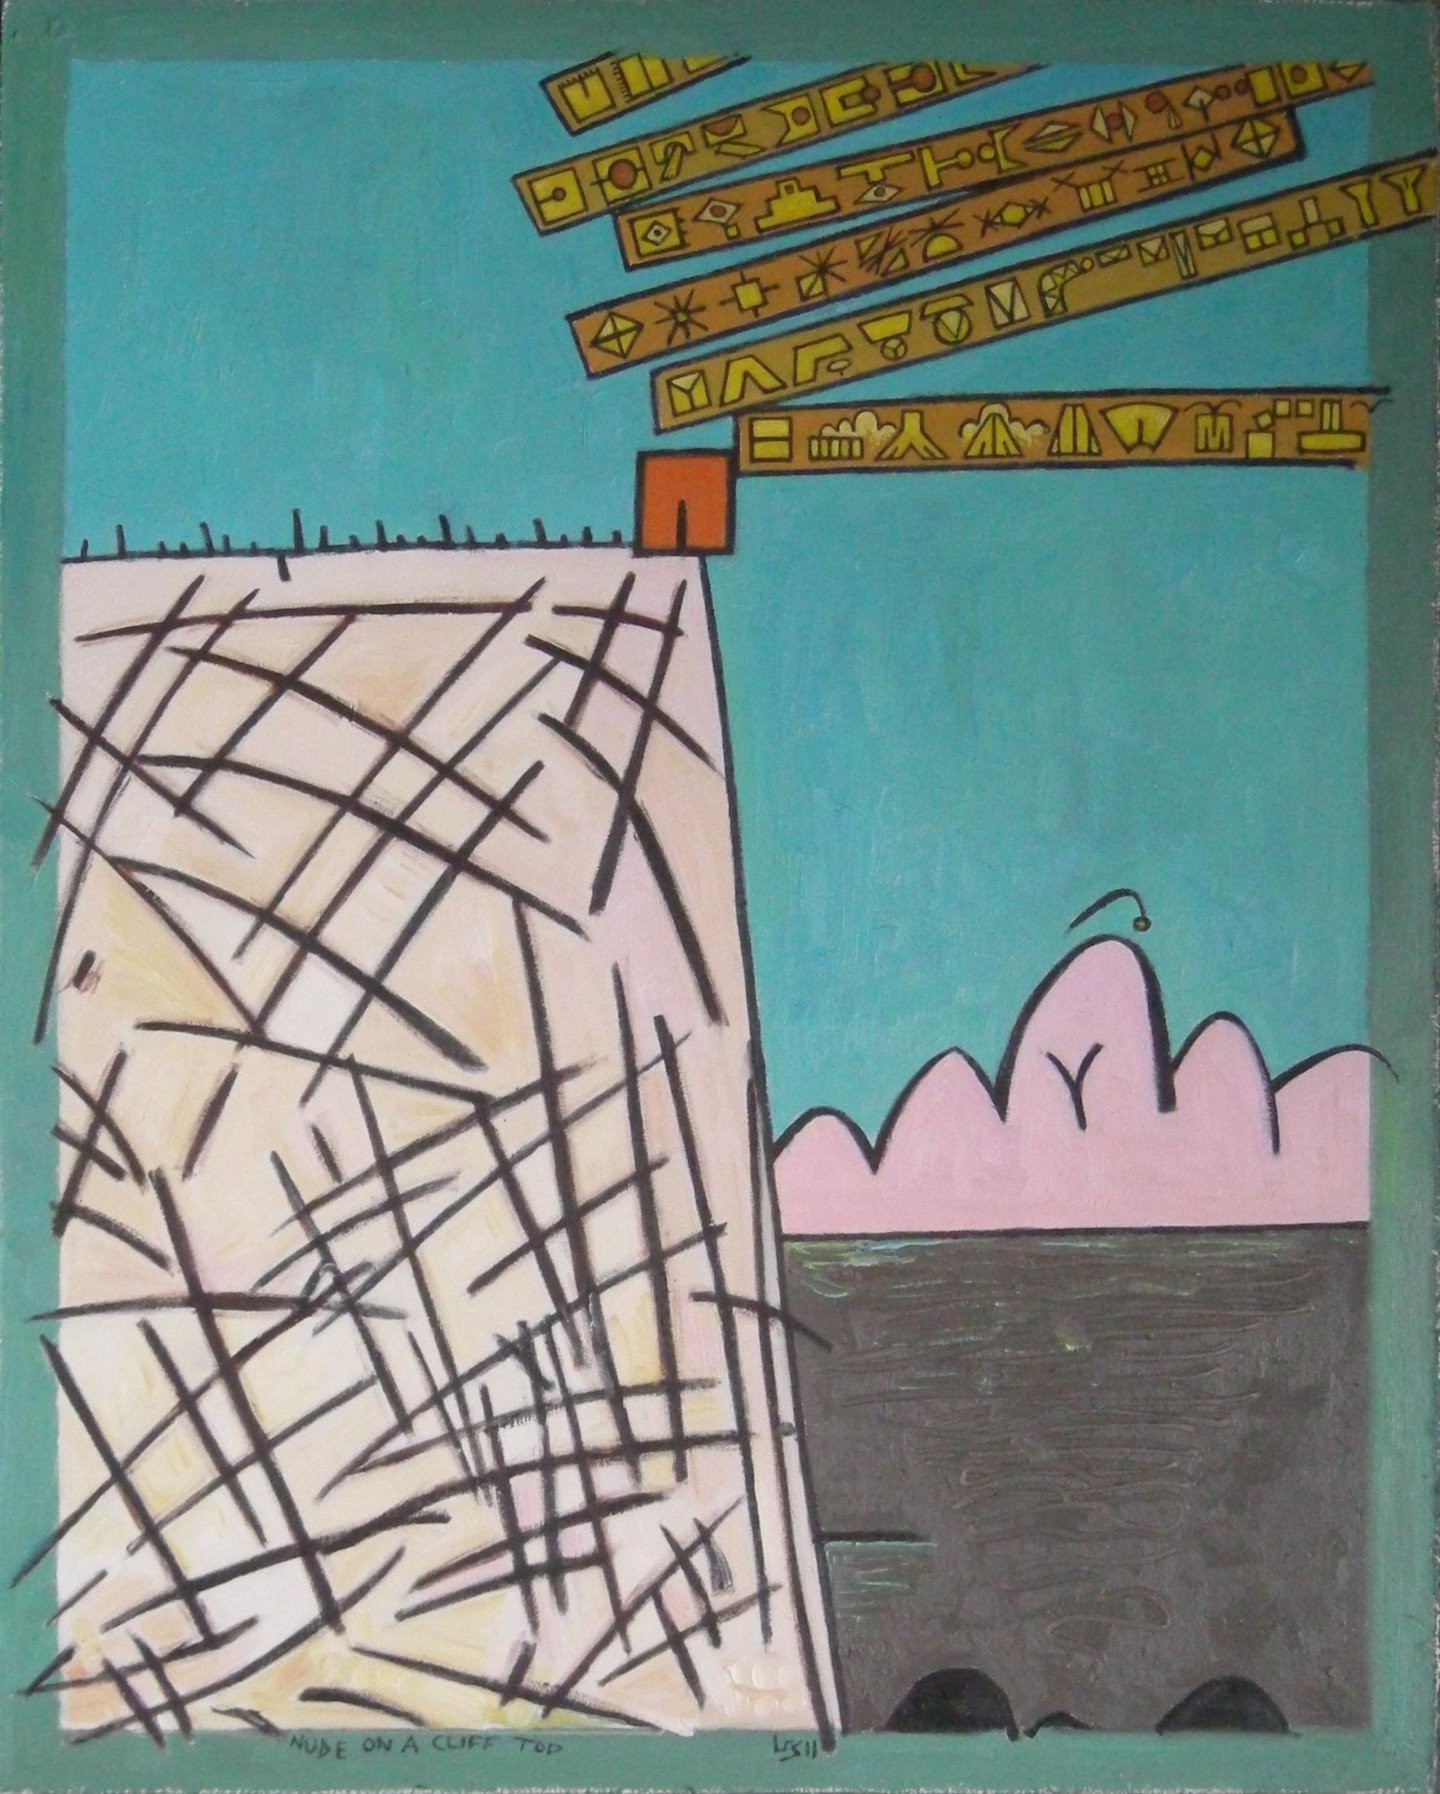 Gerald Shepherd - Nude On A Cliff Top